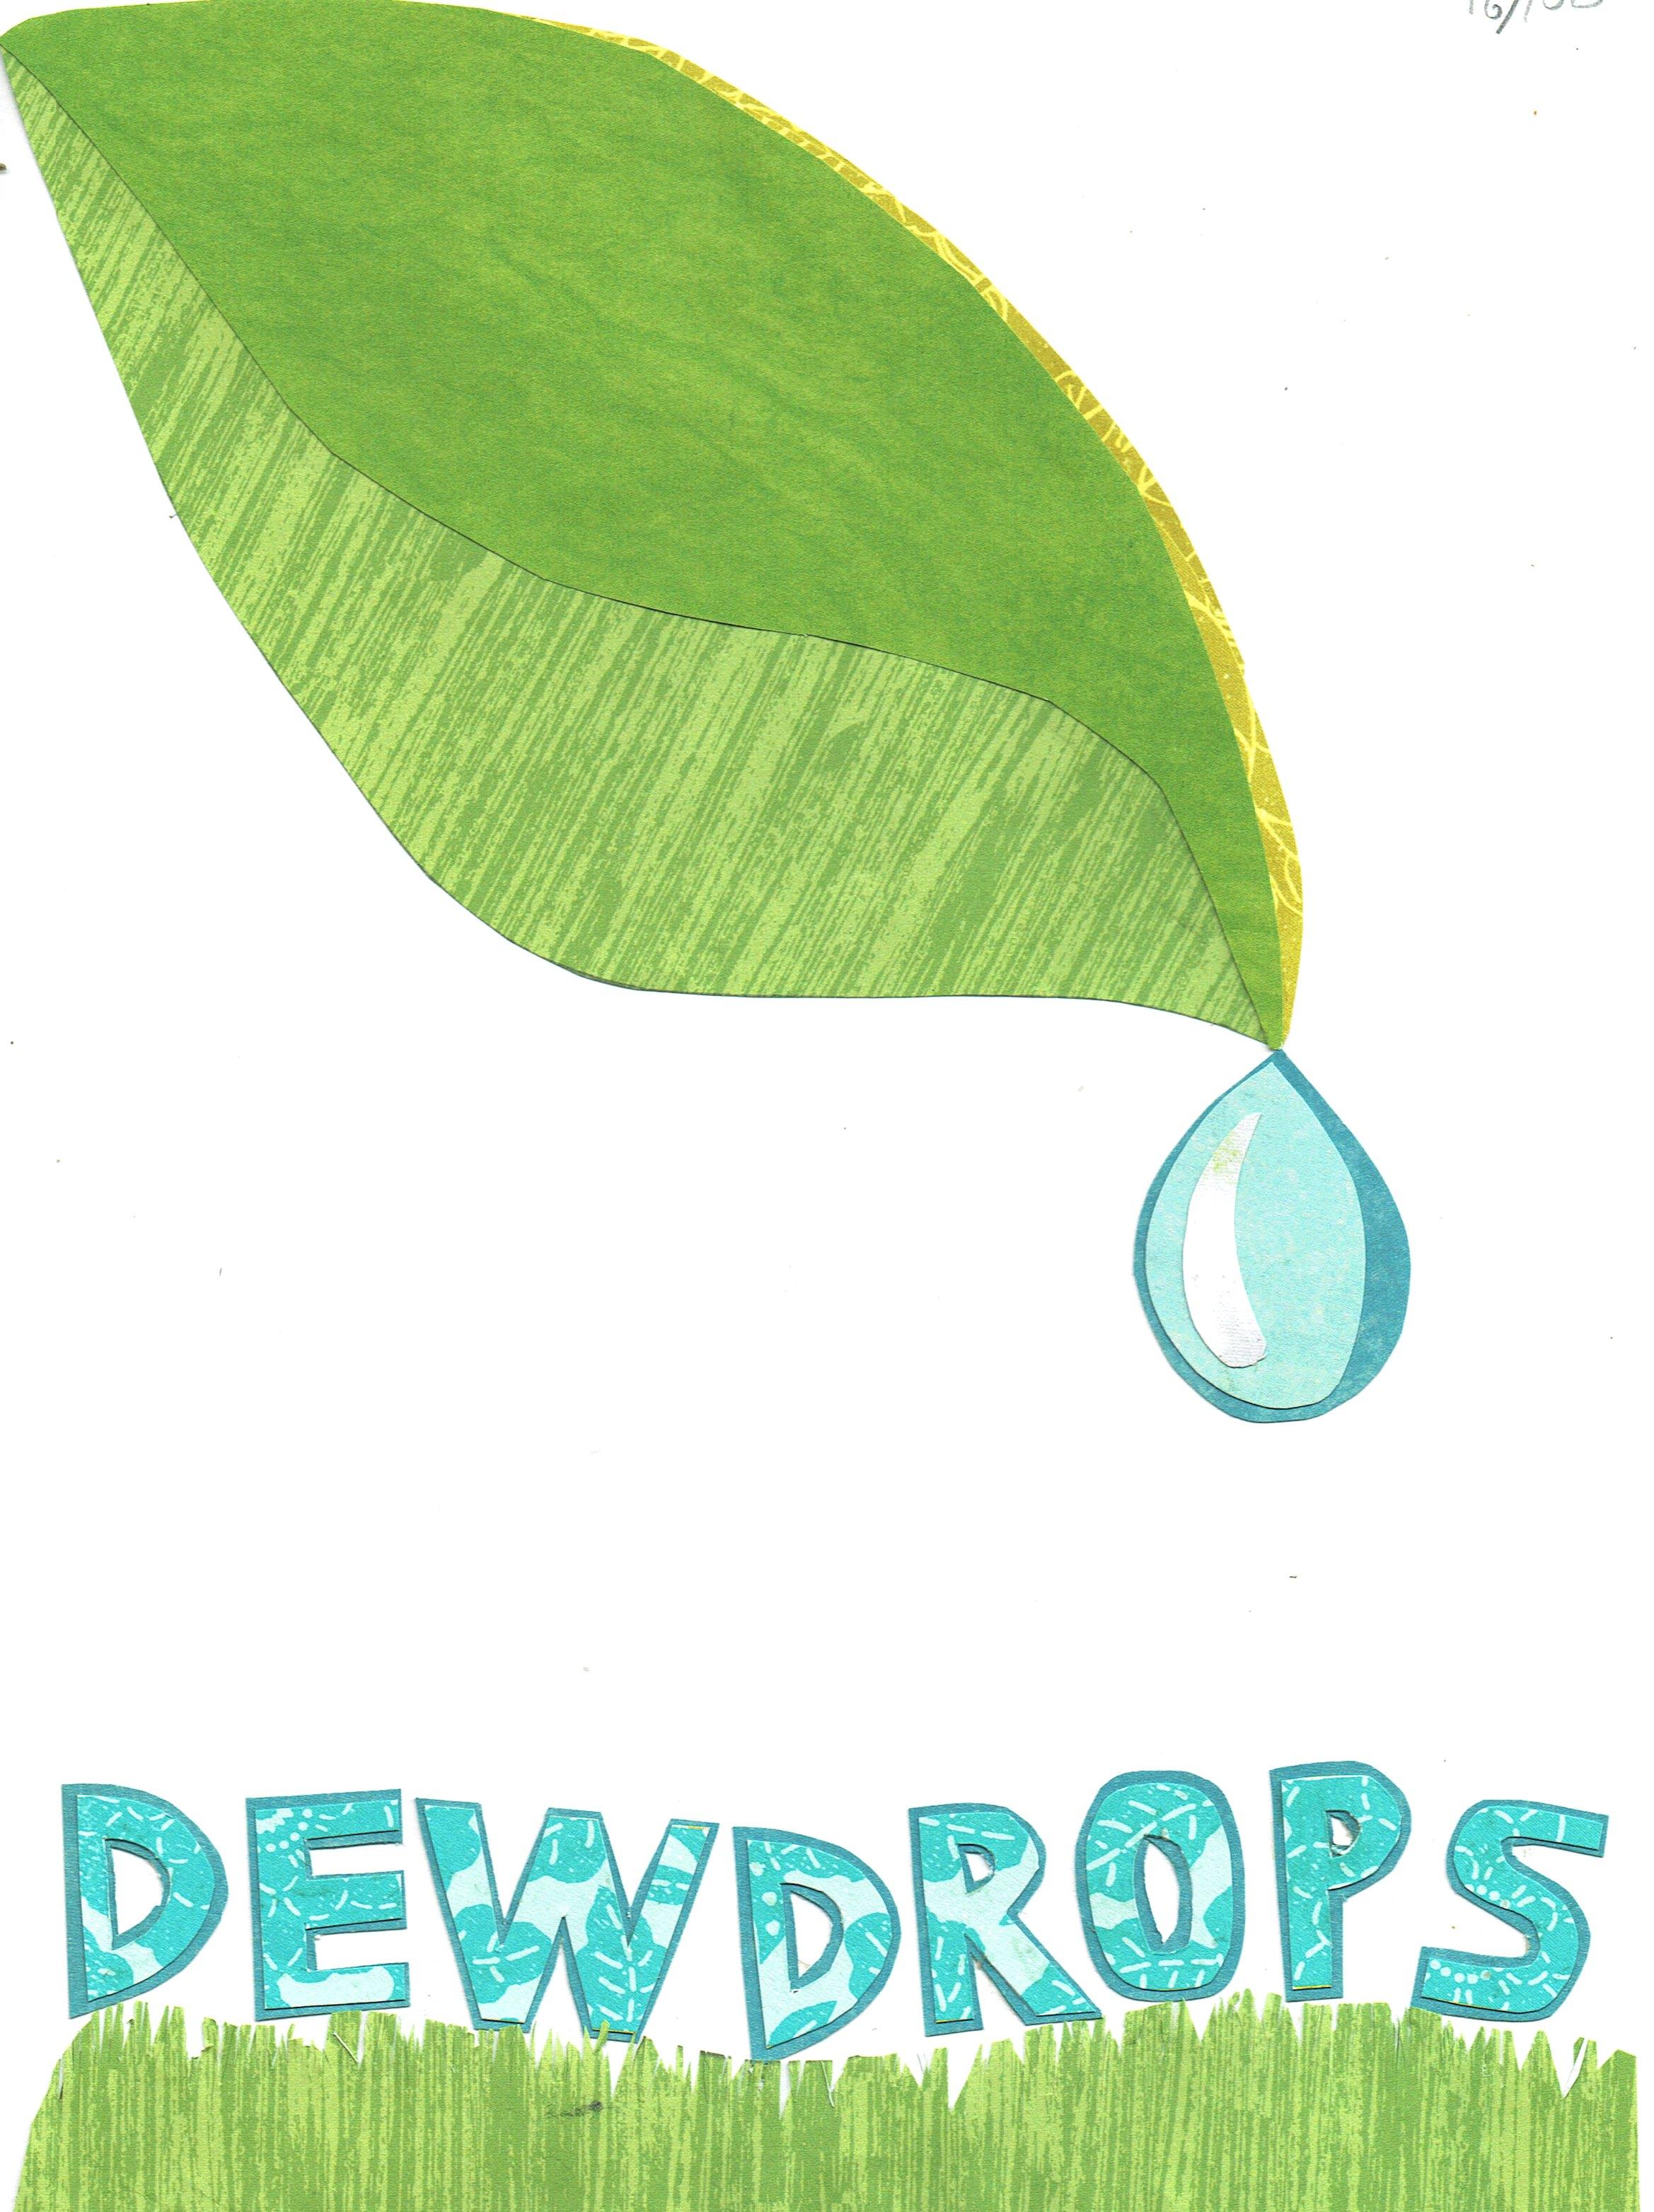 Day 16 - Dewdrops